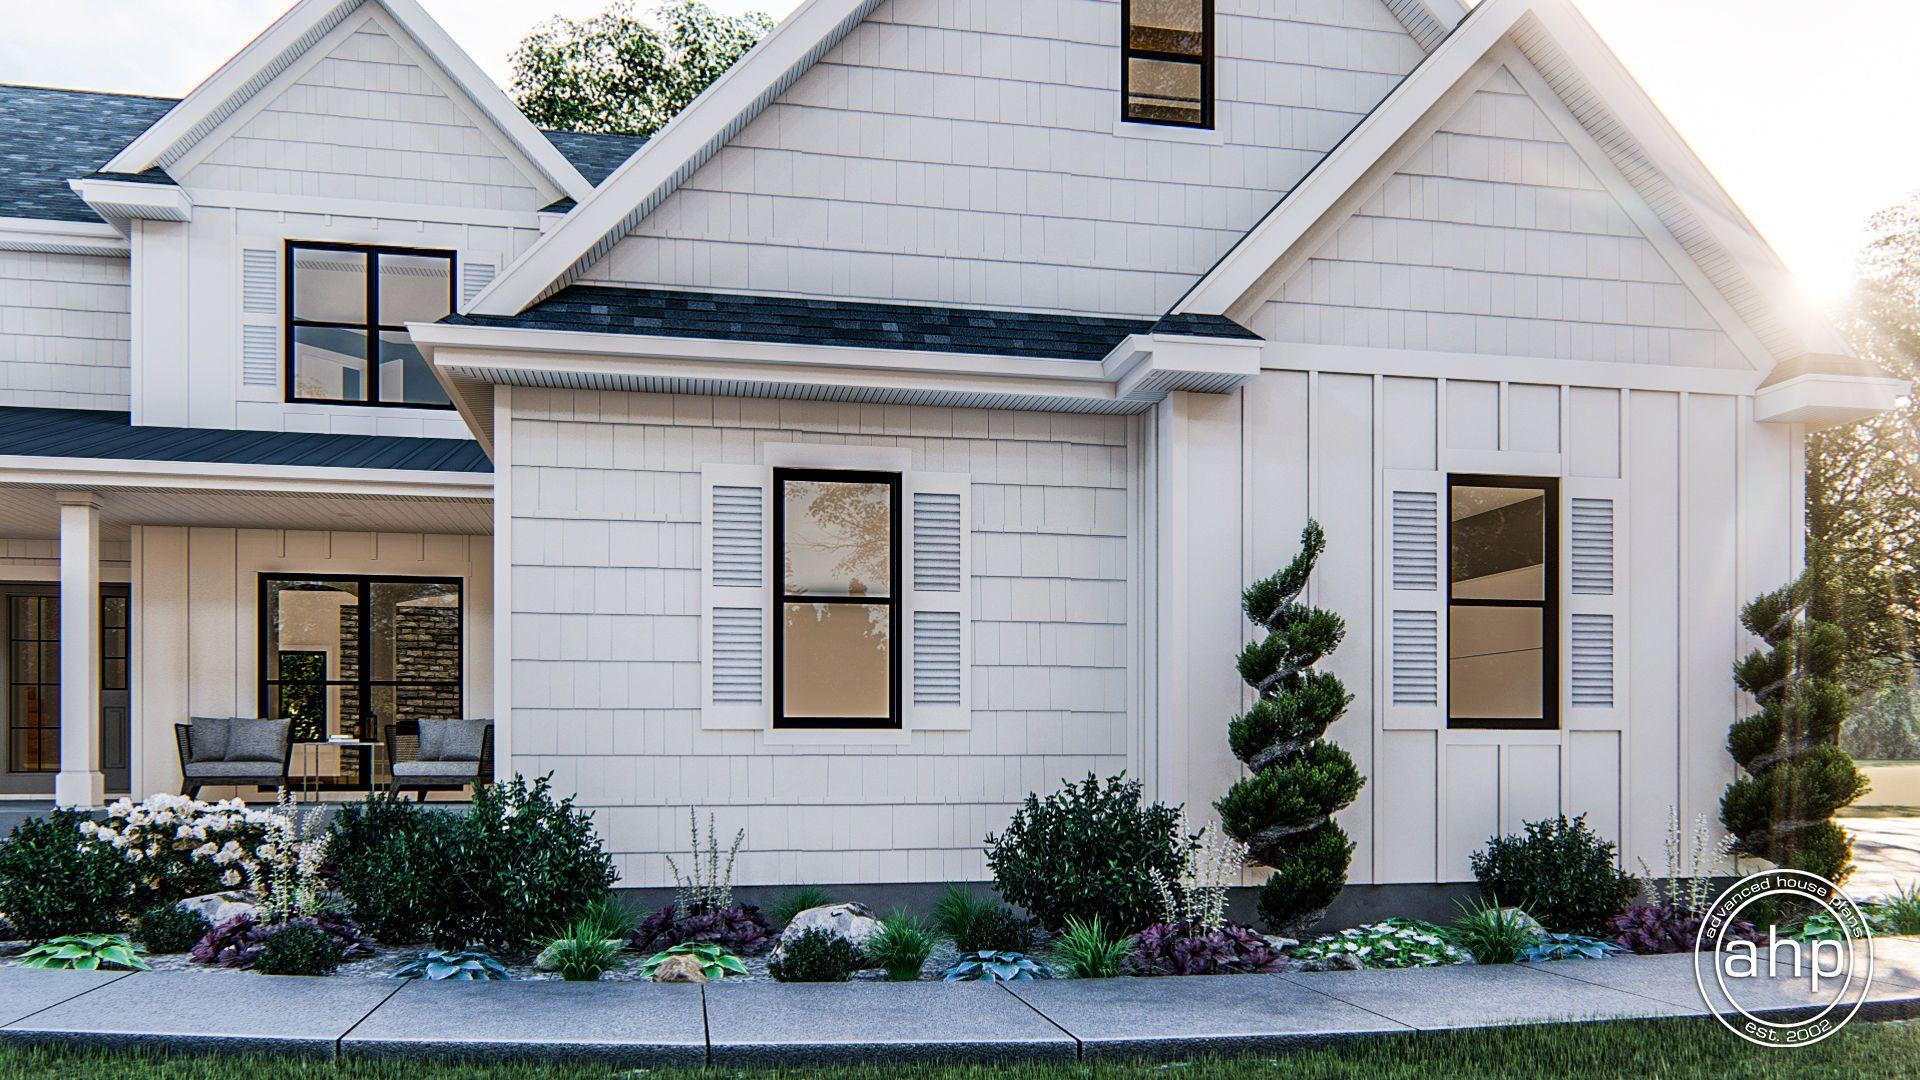 Pine Valley 1.5 Story Modern Farmhouse House Plan House